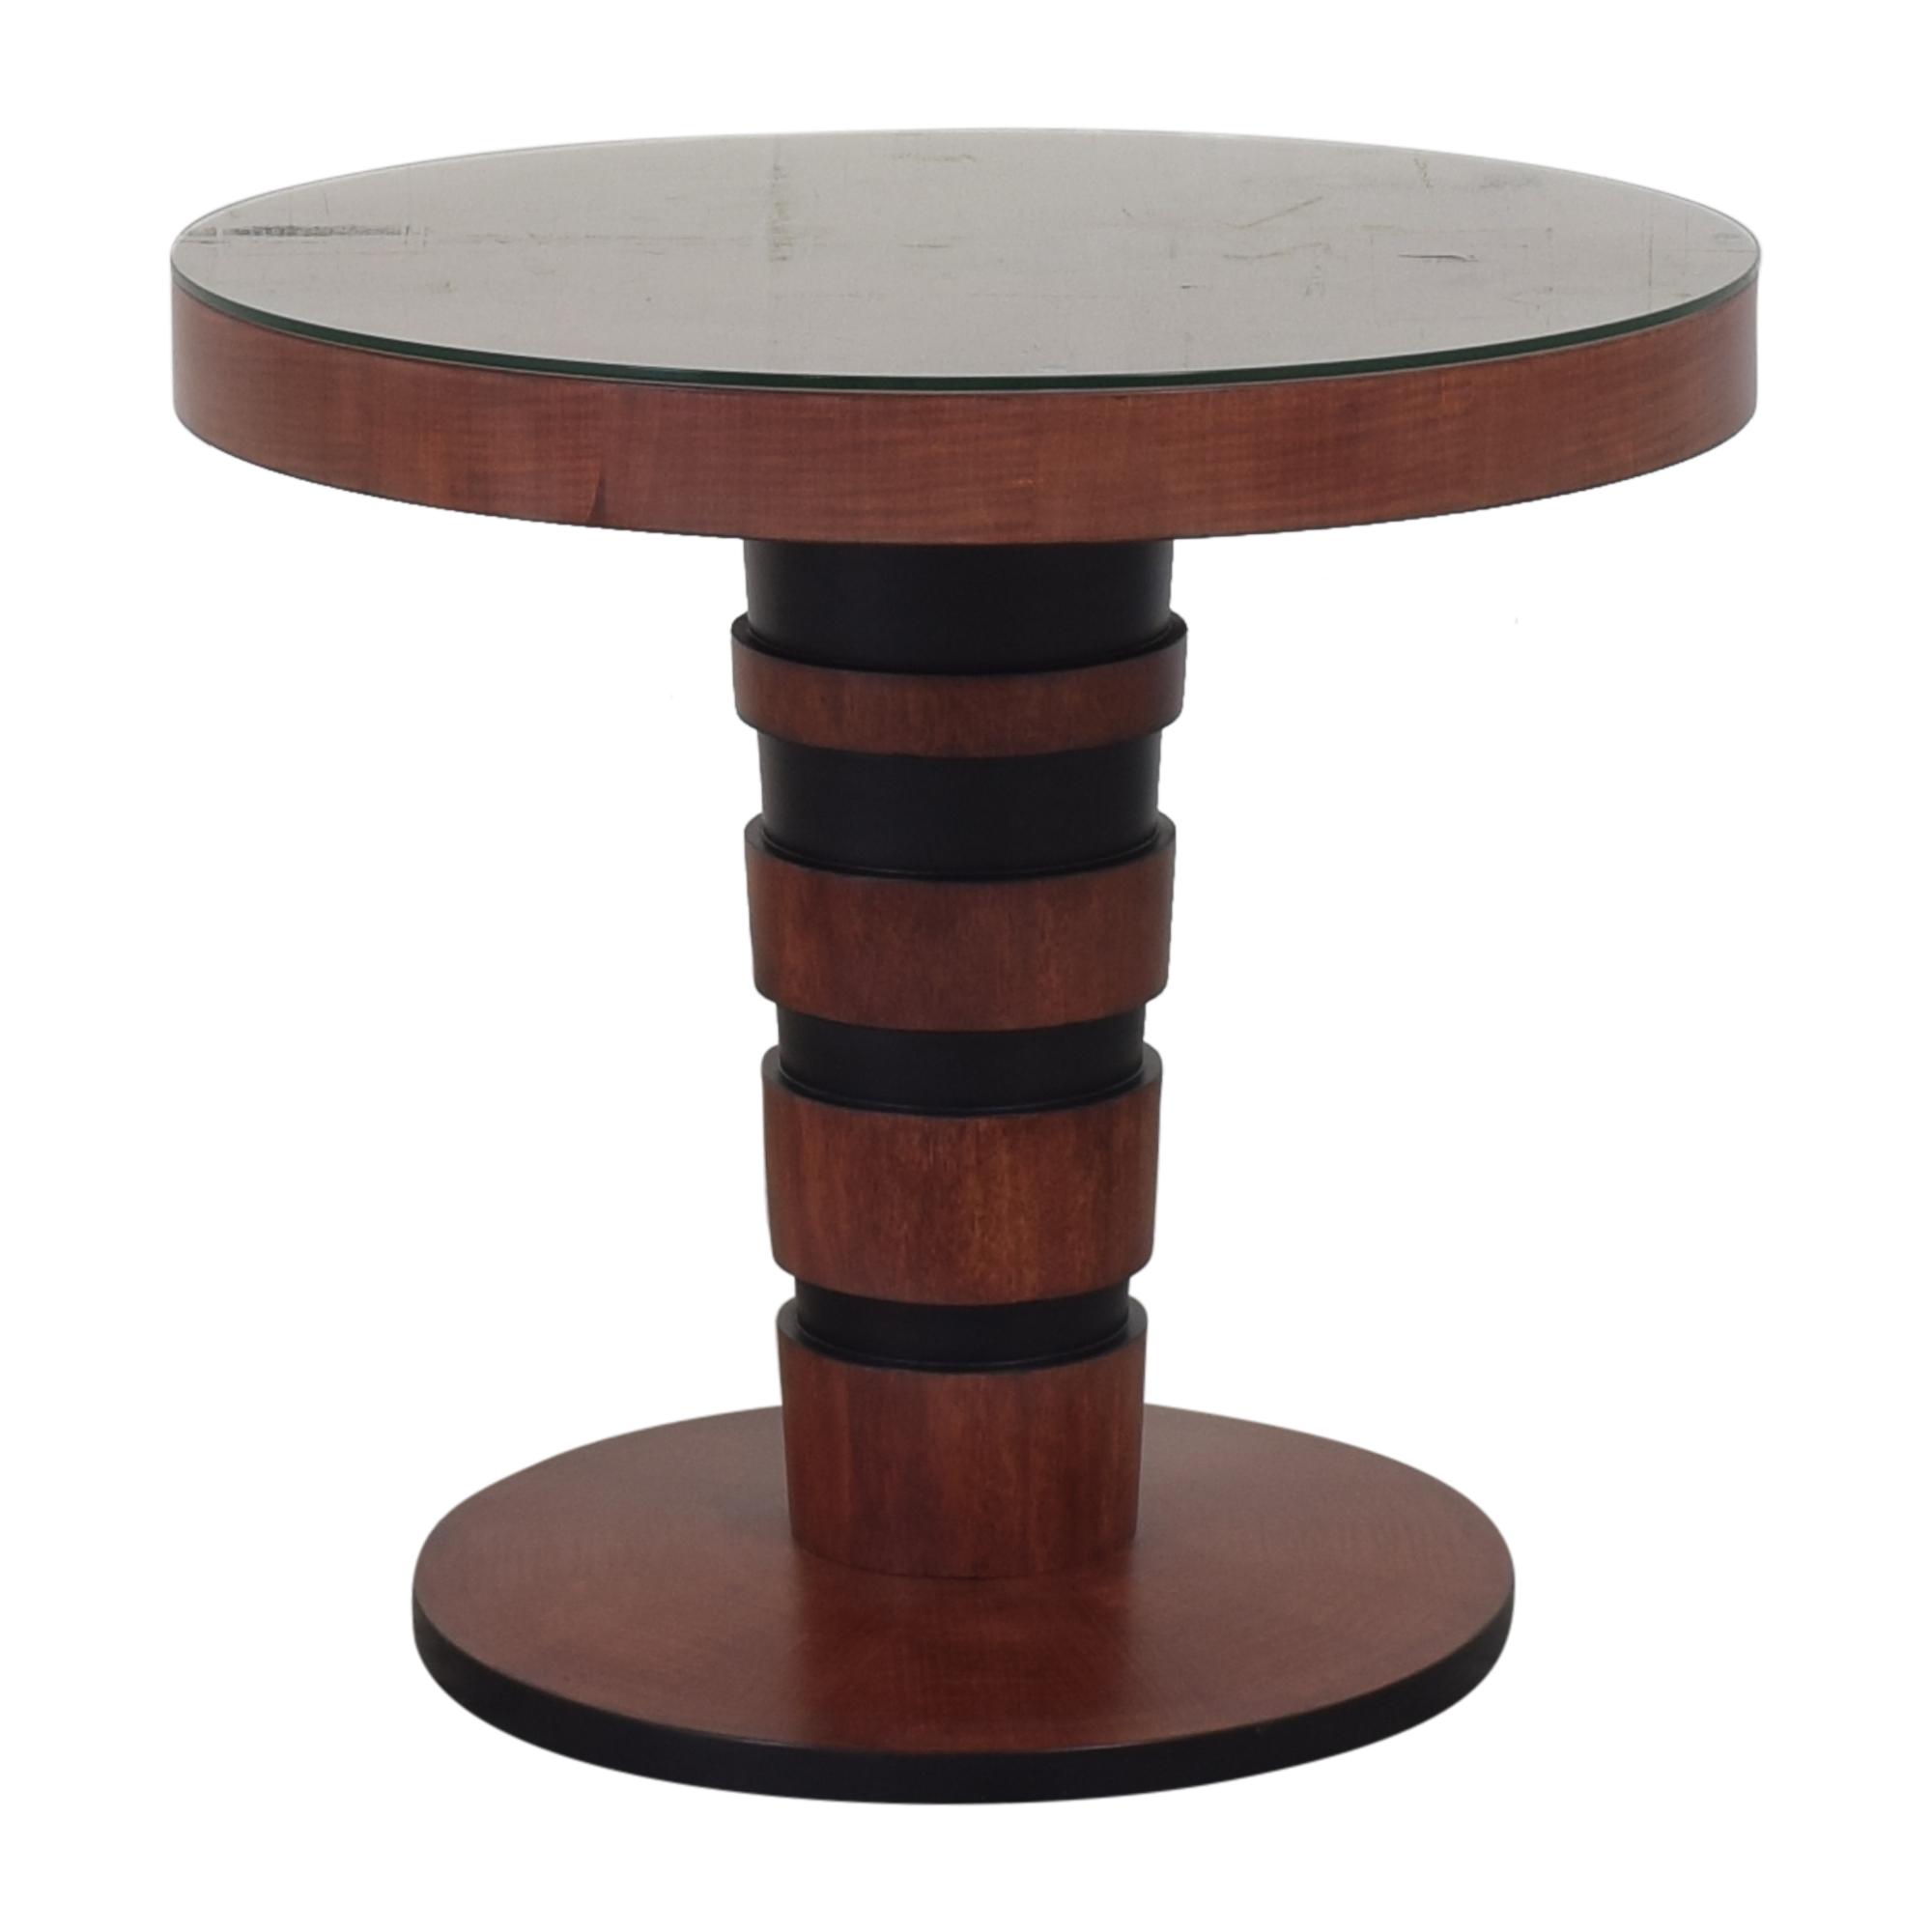 John Widdicomb Co. Larry Laslo for John Widdicomb Co. Round Side Table dimensions